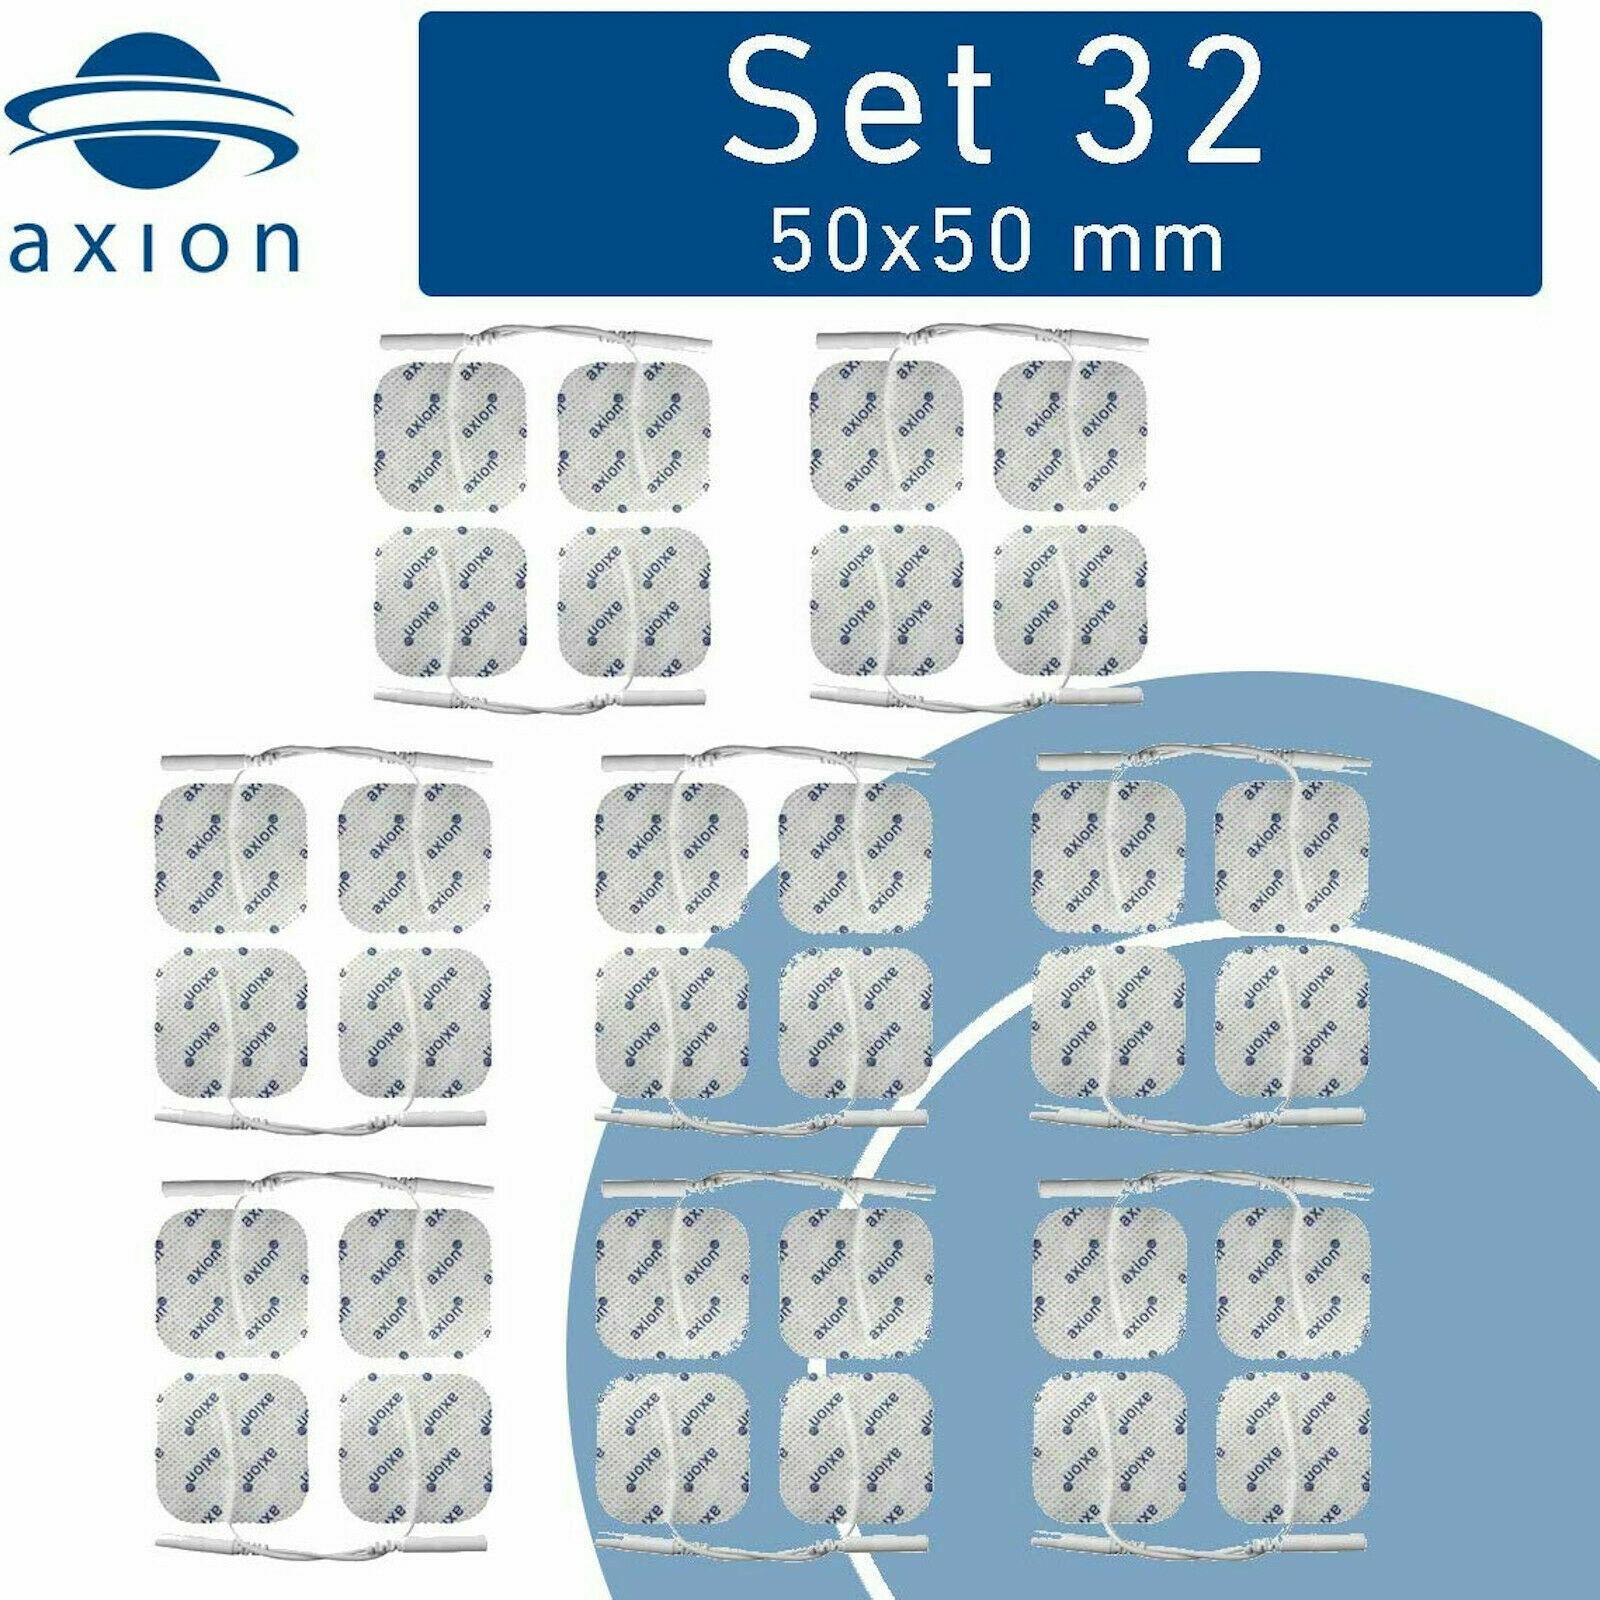 32 axion TENS Elektroden-Pads 50x50mm Sparpaket EMS Geräte mit 2mm-Stecker